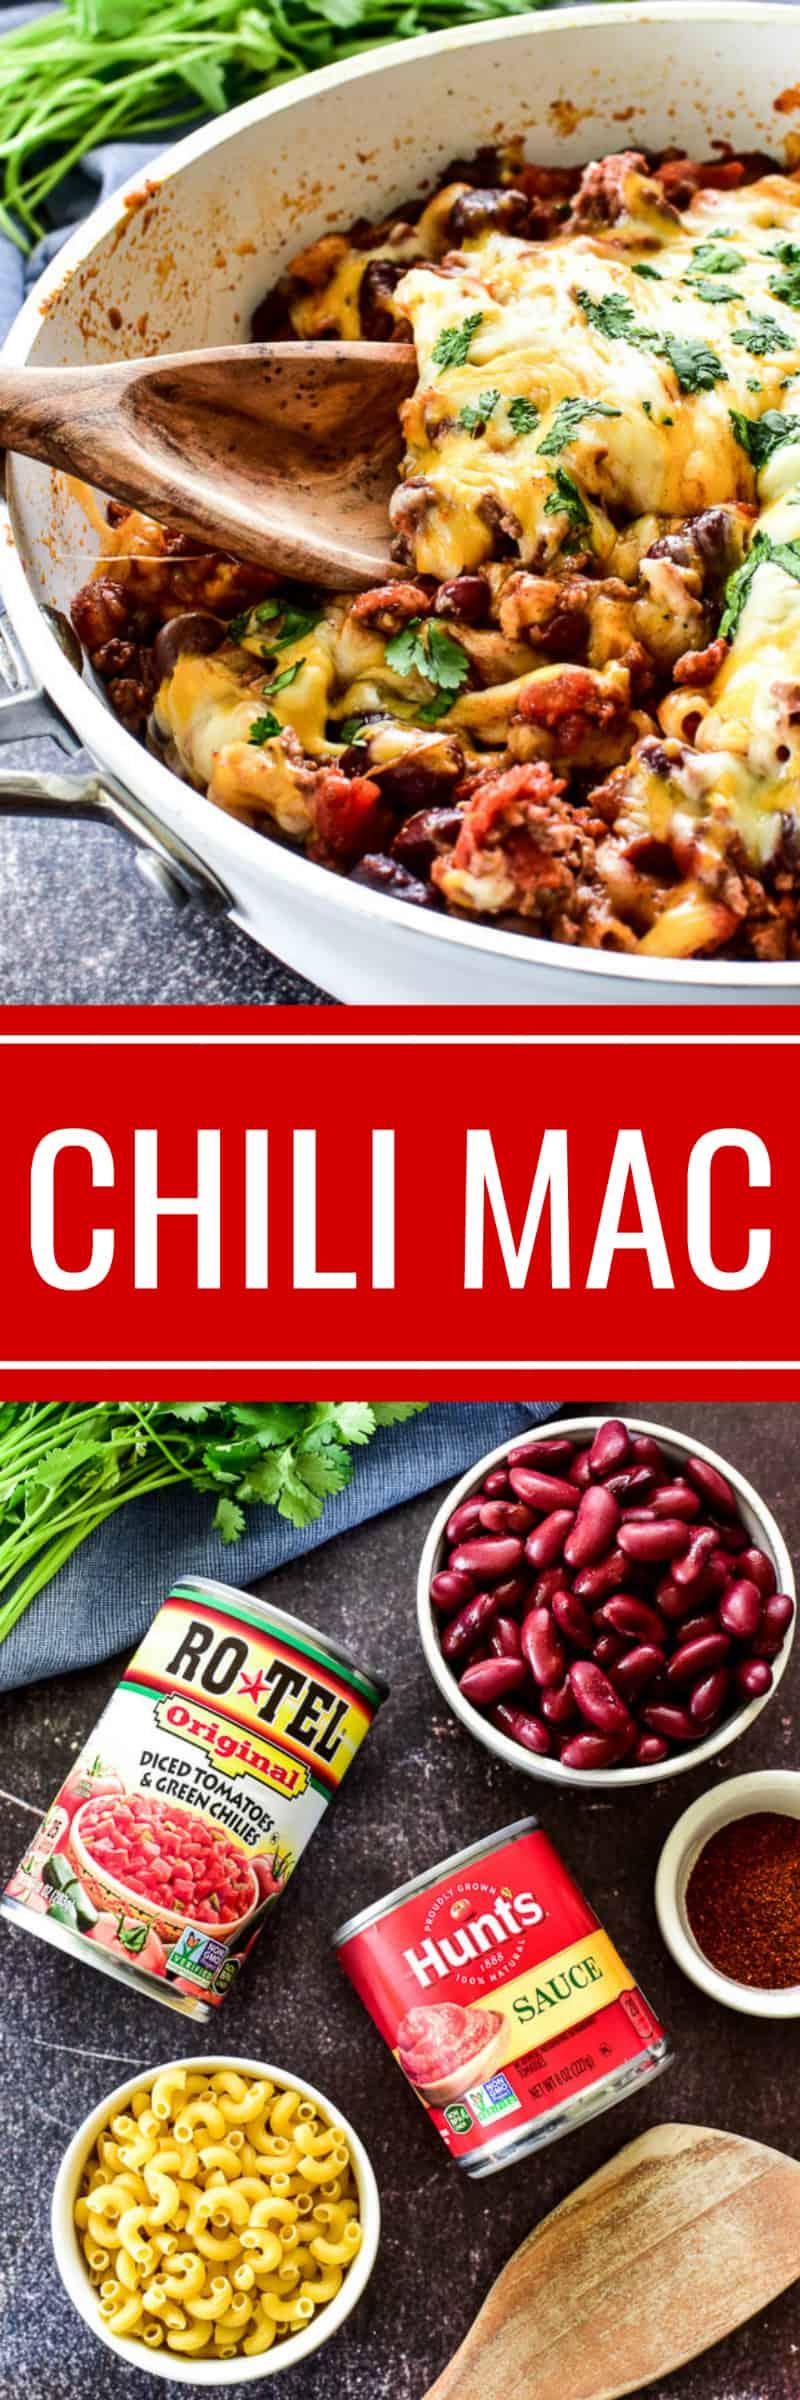 Chili Mac collage image